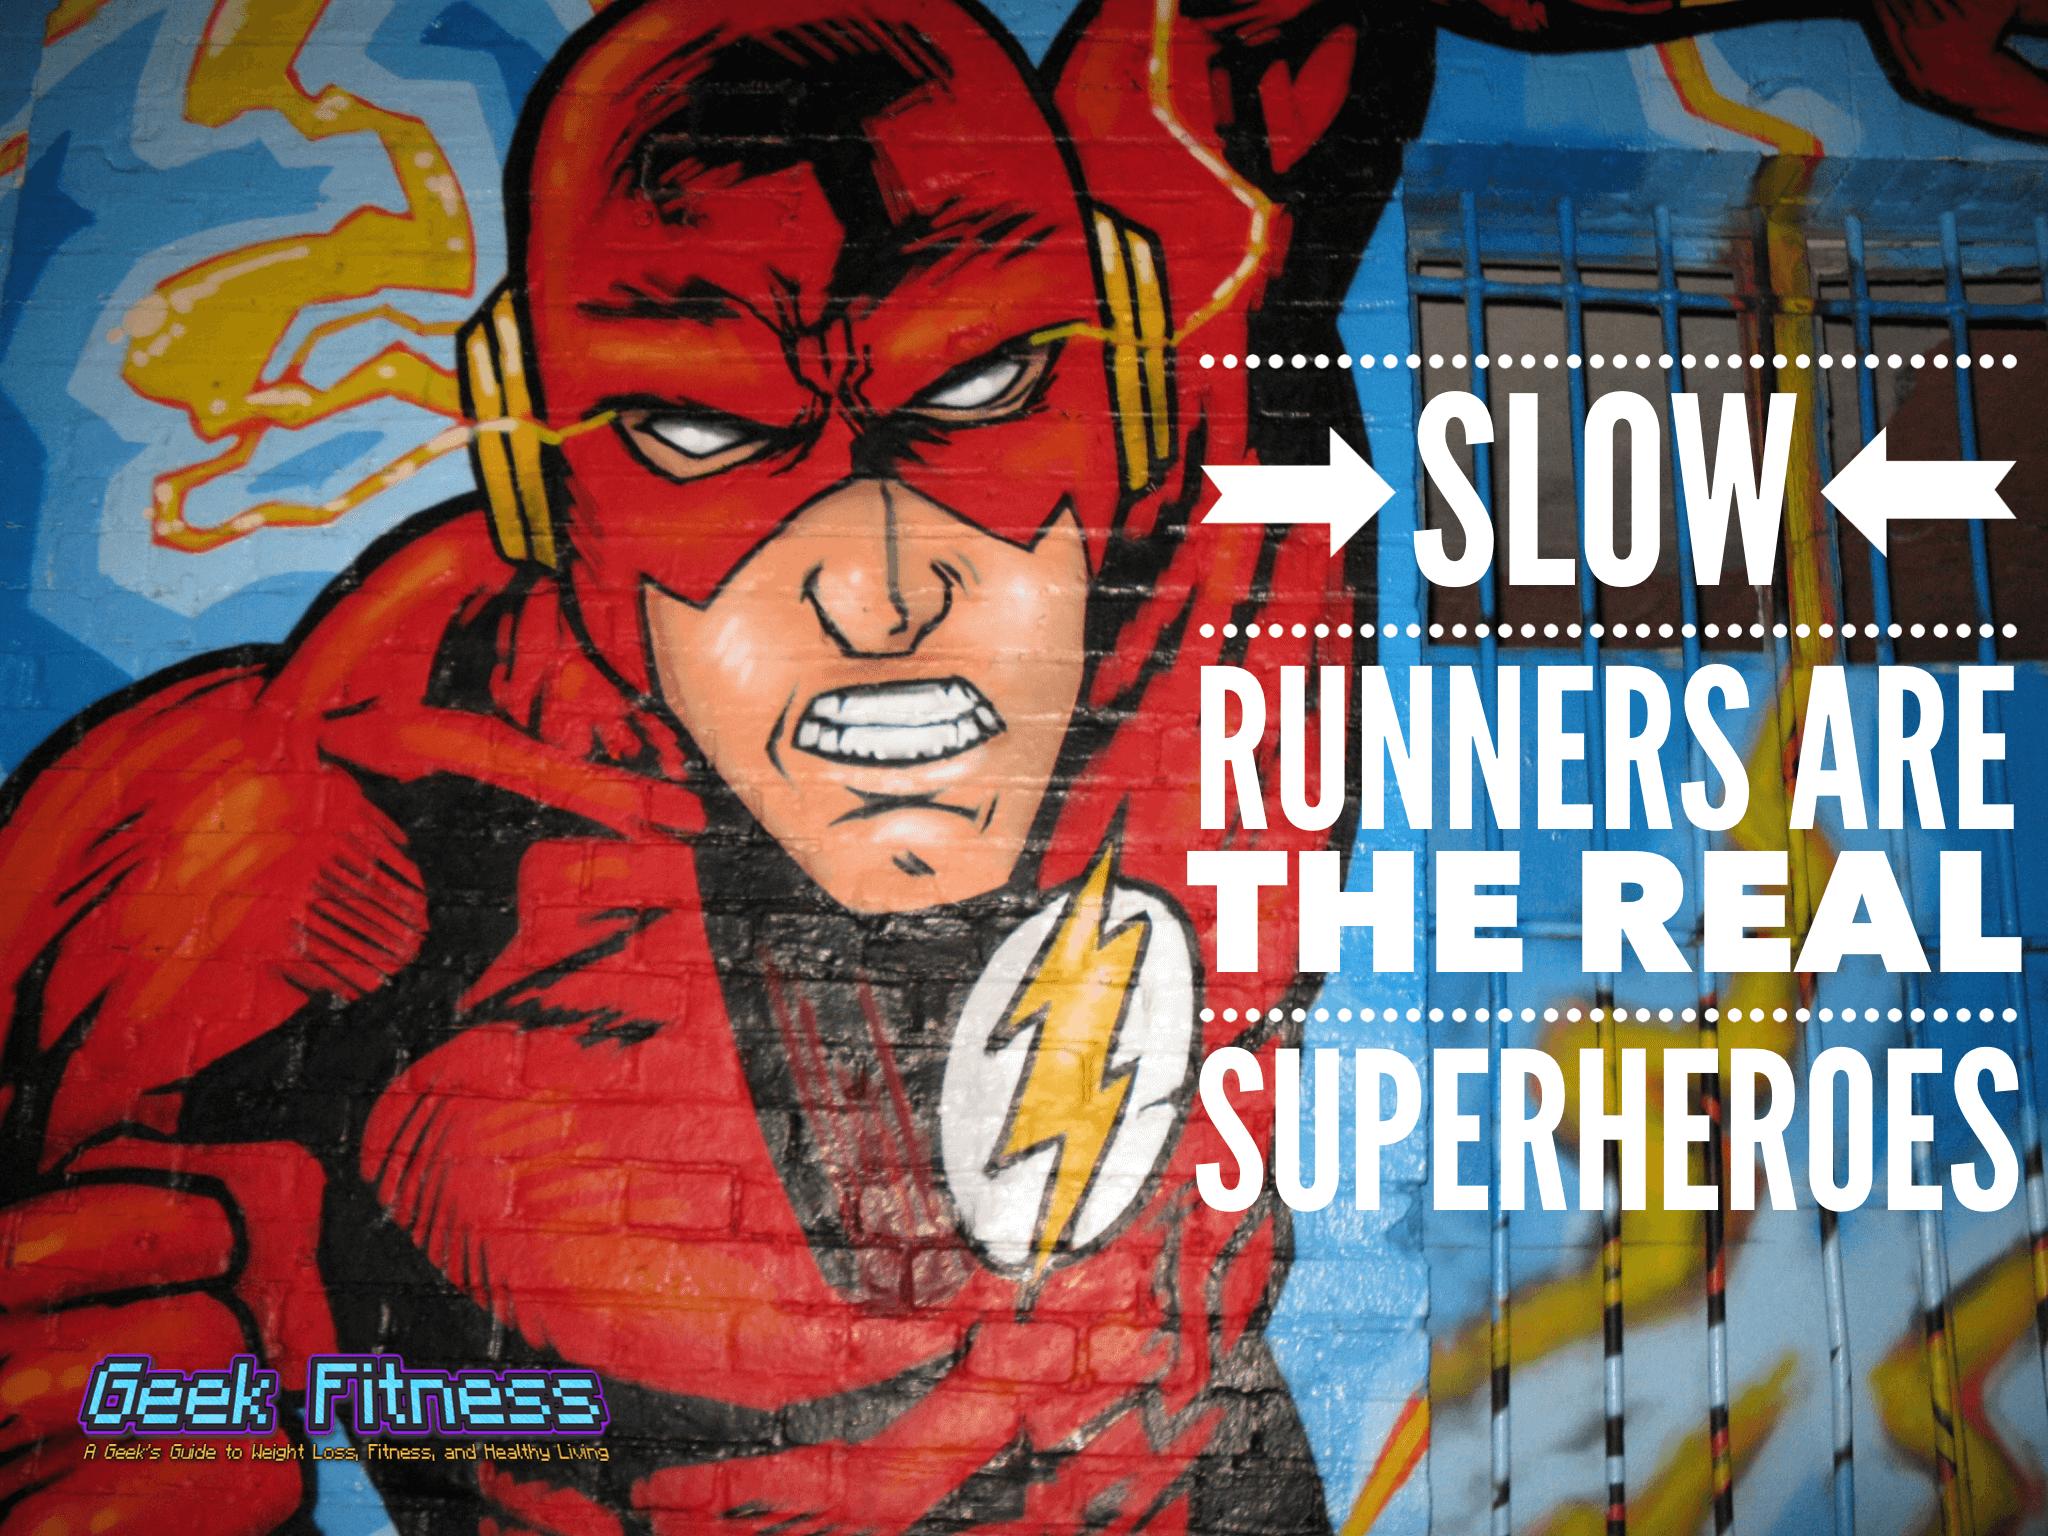 Slow Runners are Superheroes